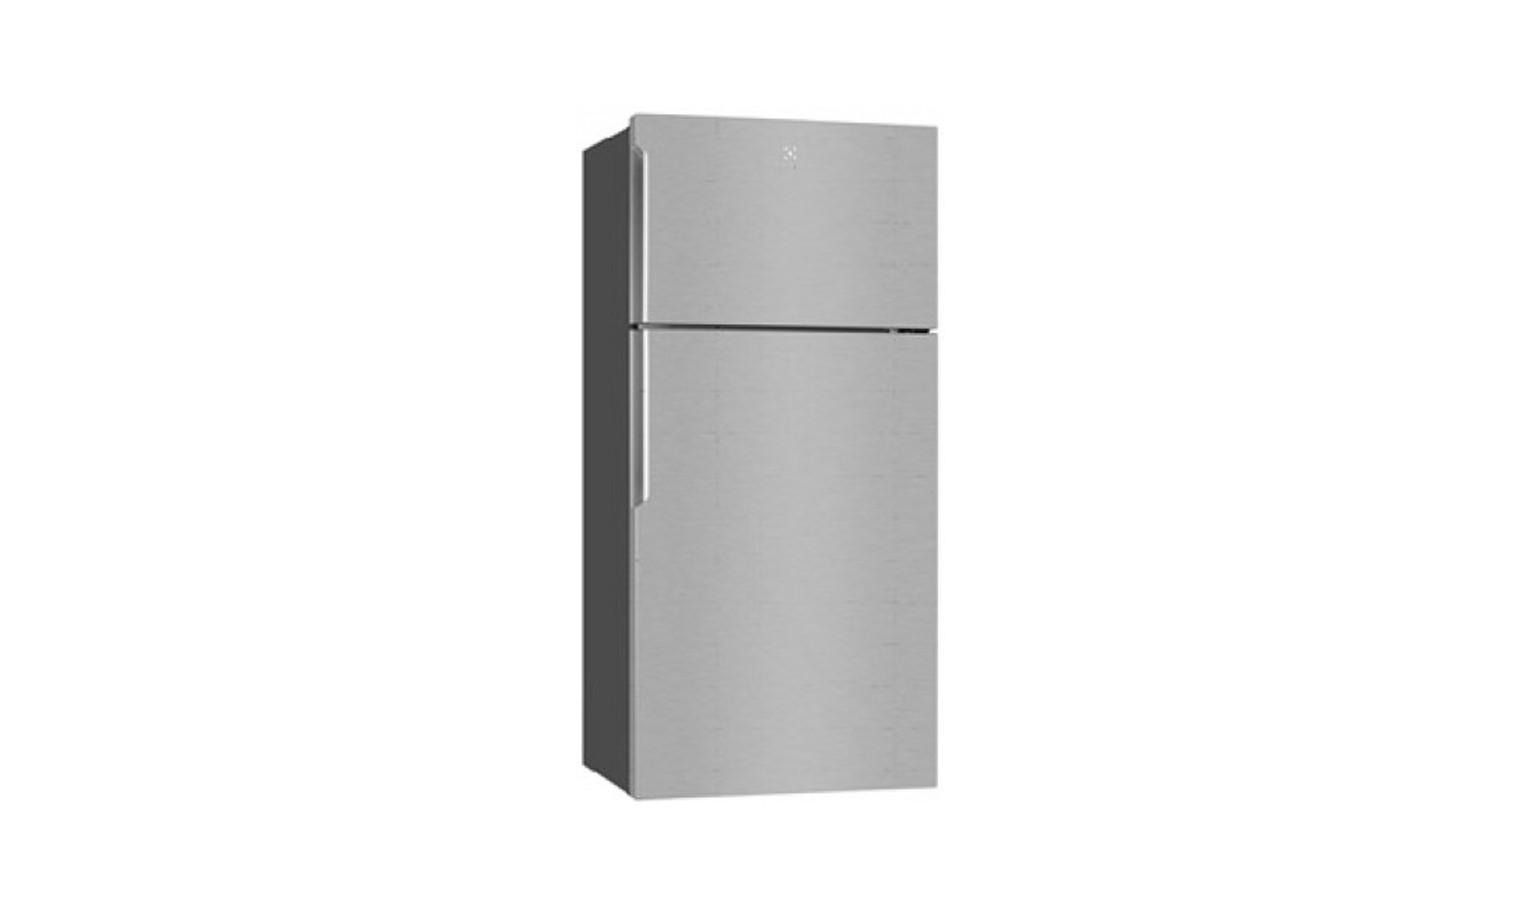 Electrolux ETB5400BA 503L 2-Door Top Freezer Fridge - Arctic Silver